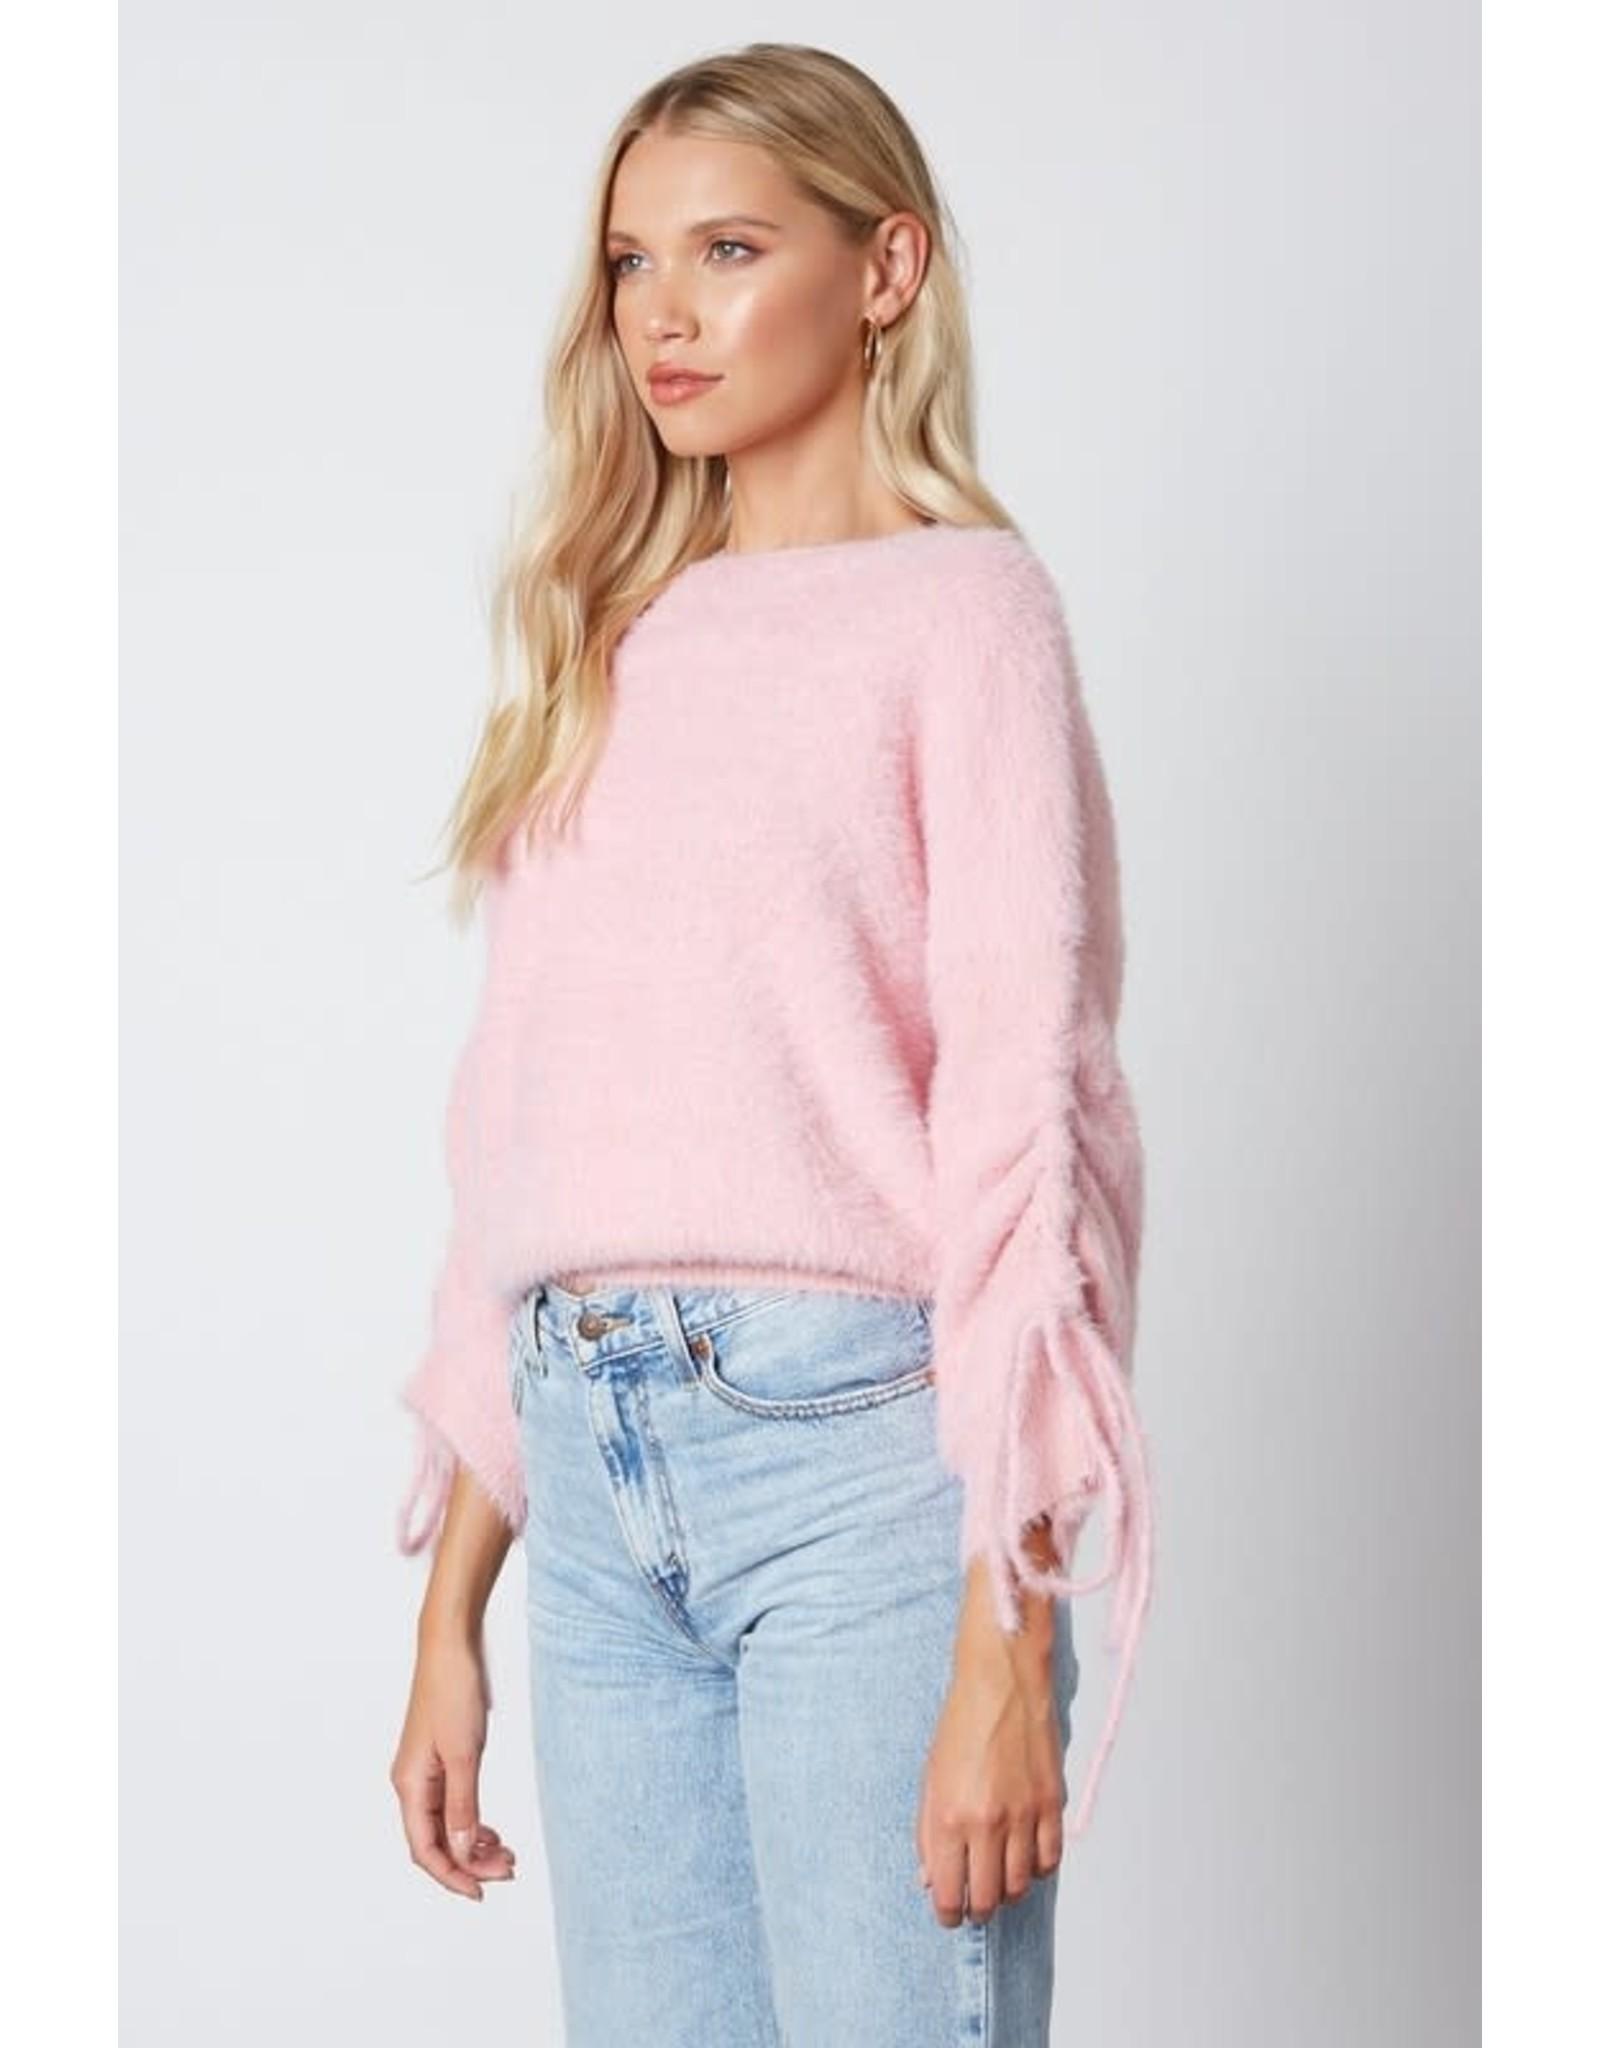 My Girly Side Sweater